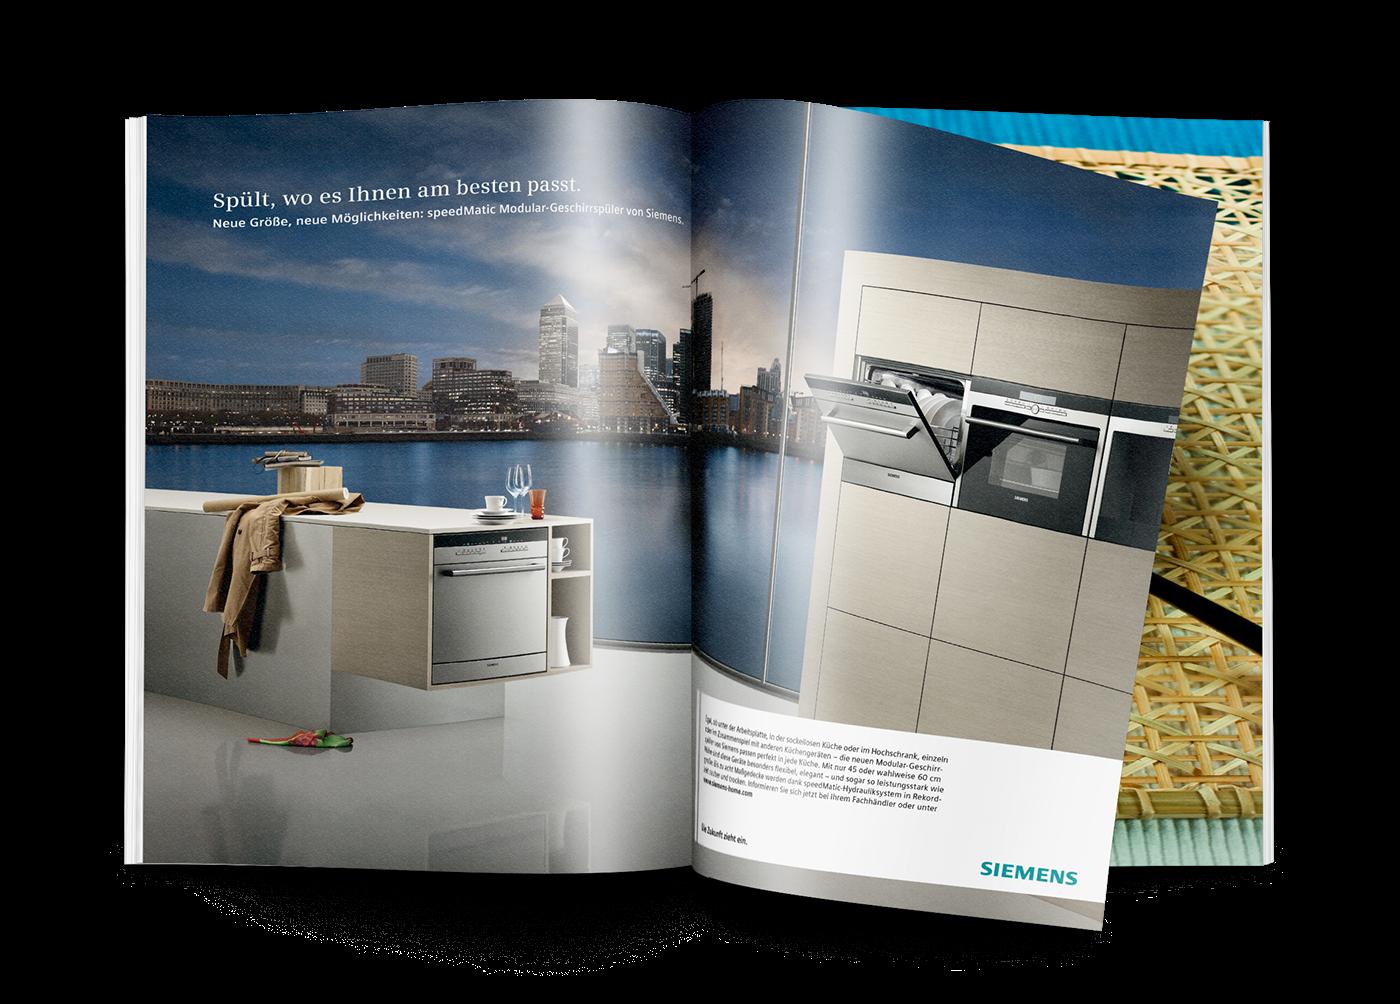 Siemens Geschirrspuler On Behance